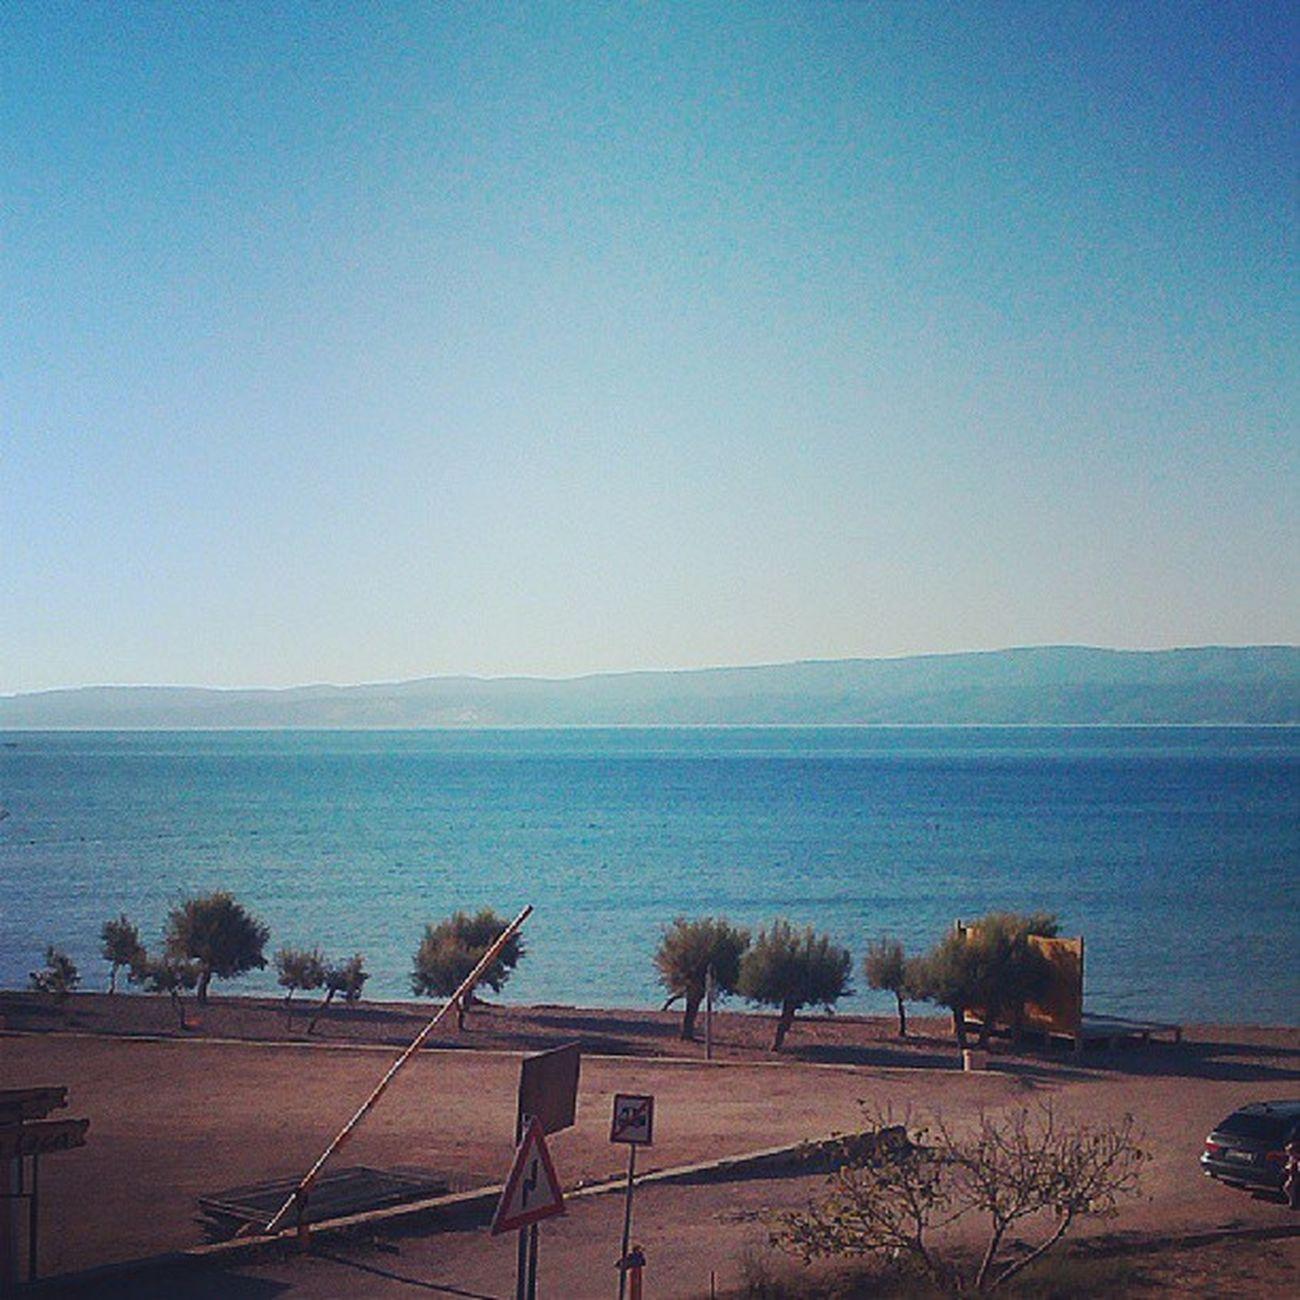 Goodbye Croatia! Byebye Jad ęDo Domu seawaterendholidaybluesky